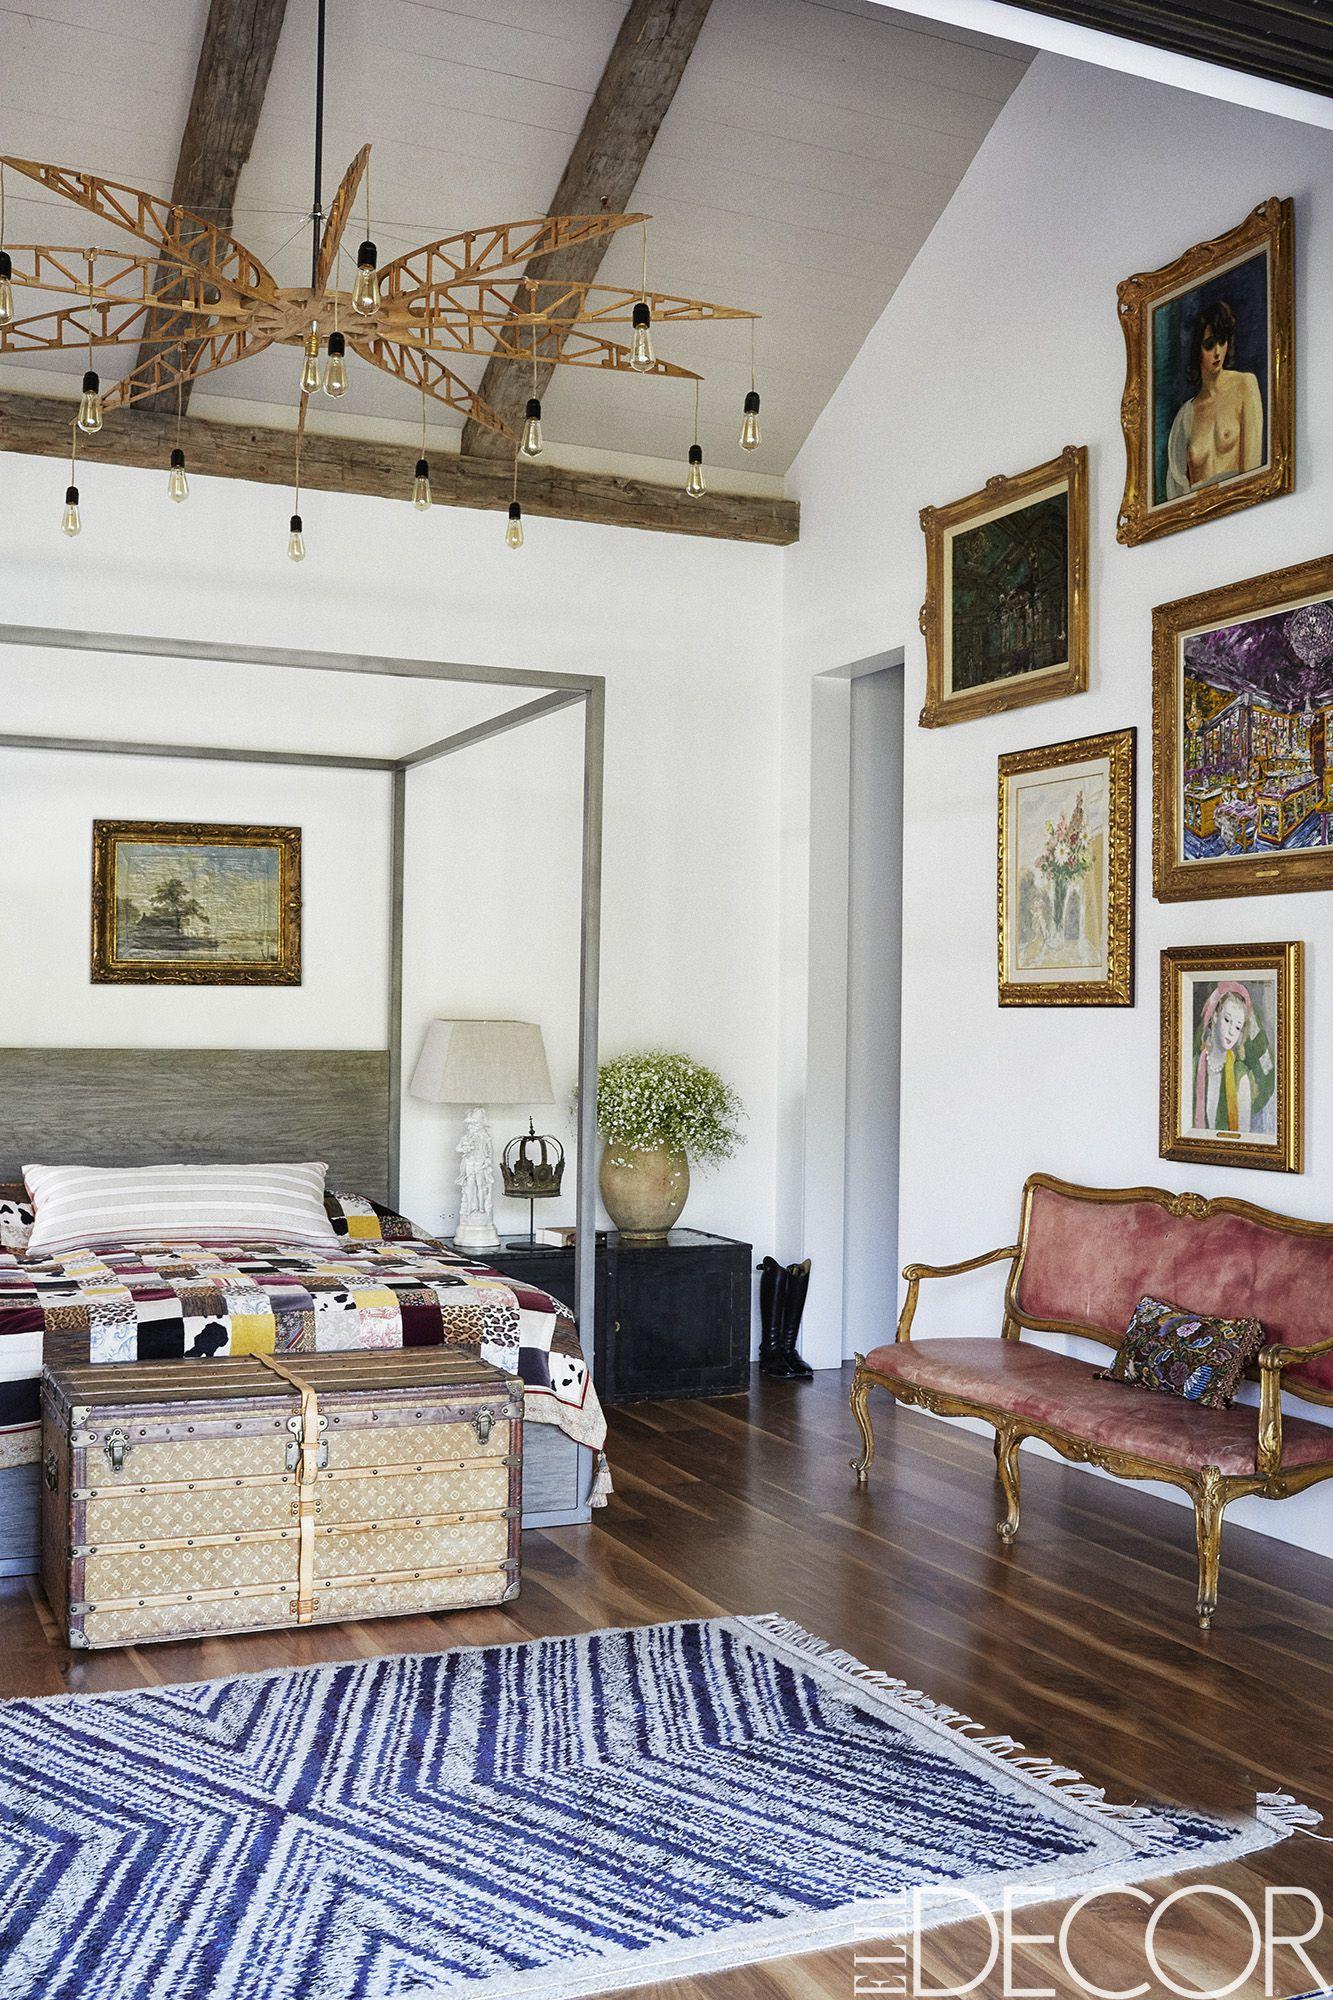 25 Best Bedroom Area Rugs - Great Ideas for Bedroom Rugs